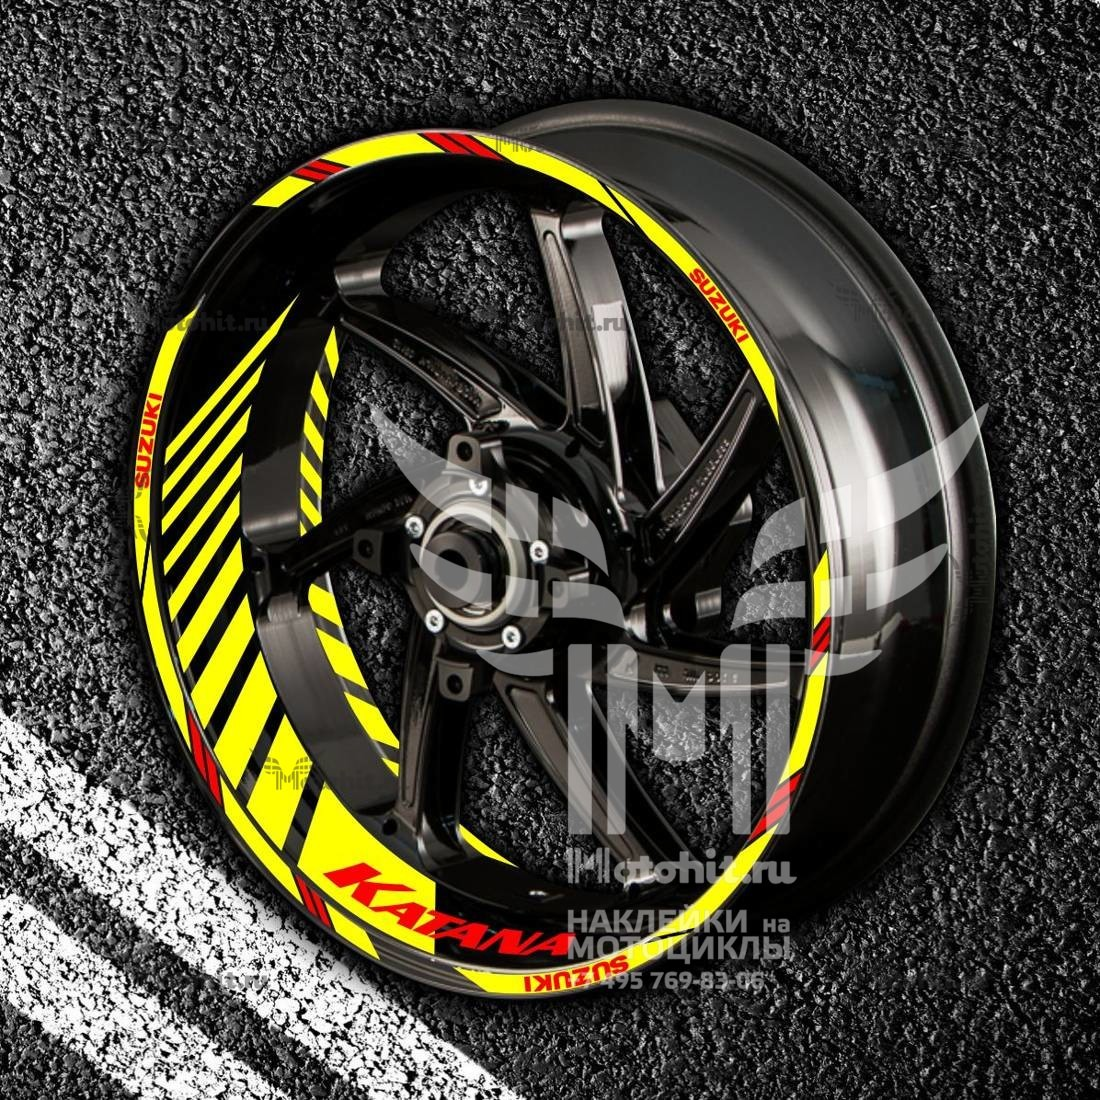 Комплект наклеек с полосами на колеса мотоцикла SUZUKI KATANA